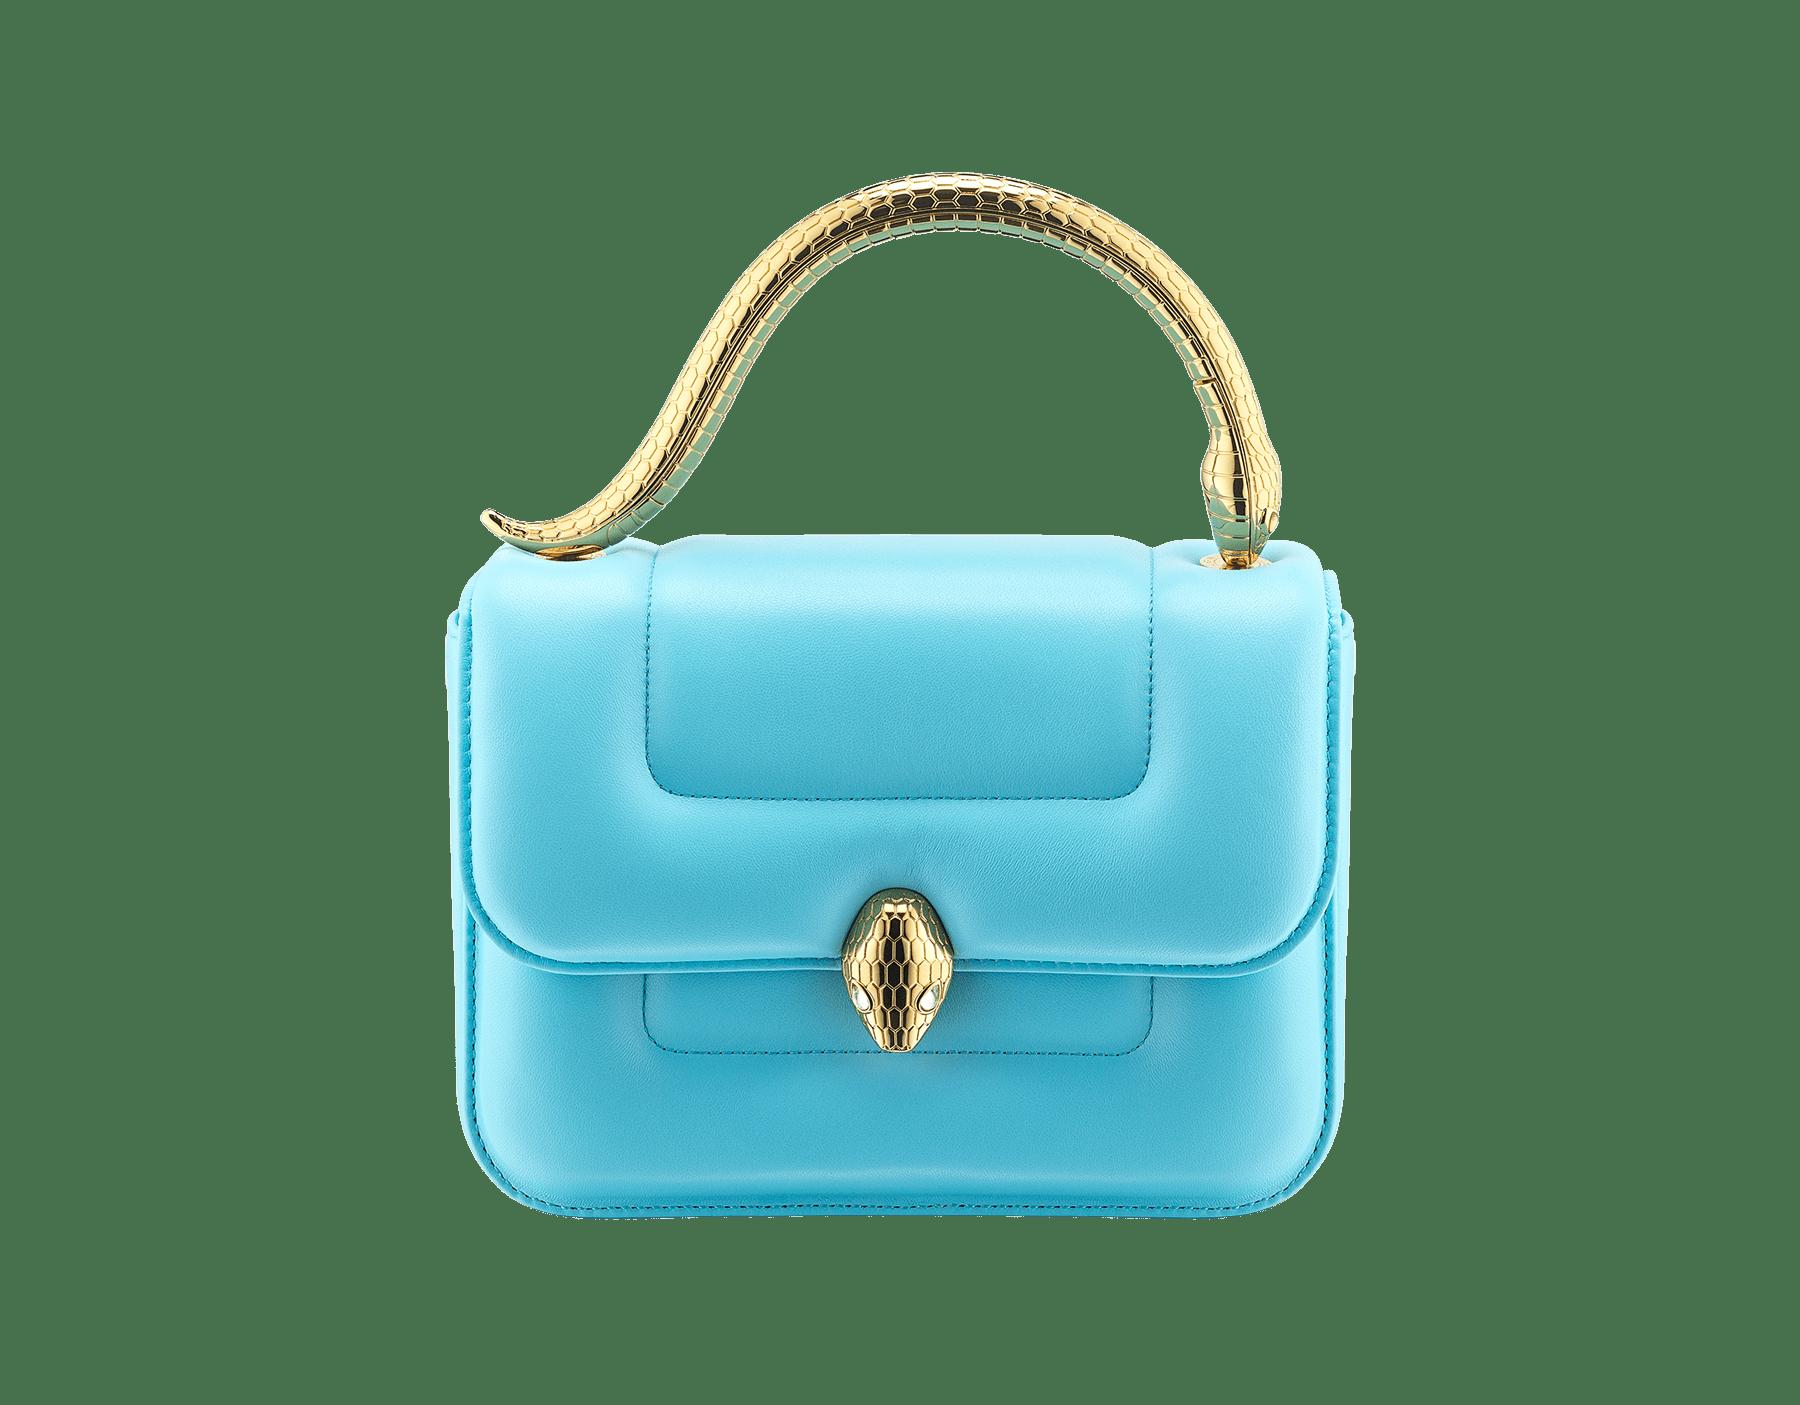 Mary Katrantzou x Bvlgari 手提包,採用柔軟的 Aegean Toapz 藍色絎縫納帕軟面皮,Aegean Toapz 藍色納帕軟面皮襯裡。新式金色黃銅 Serpenti 蛇頭扣環,誘人蛇眼鑲飾水晶。特別版包款。 MK-1142 image 1